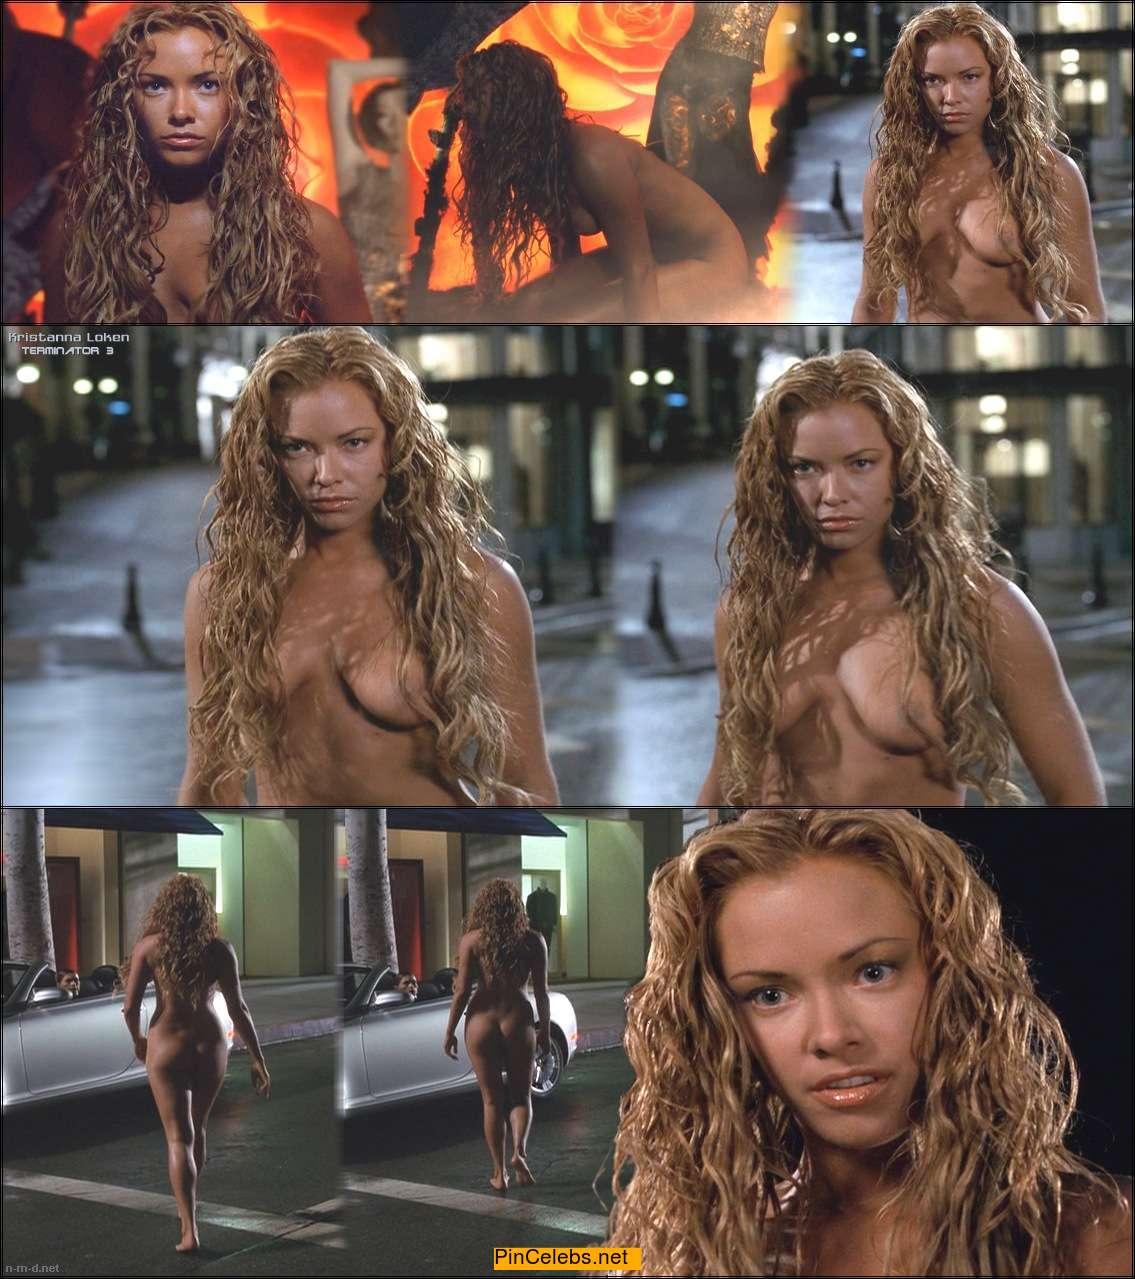 Watch Kristanna loken naked video